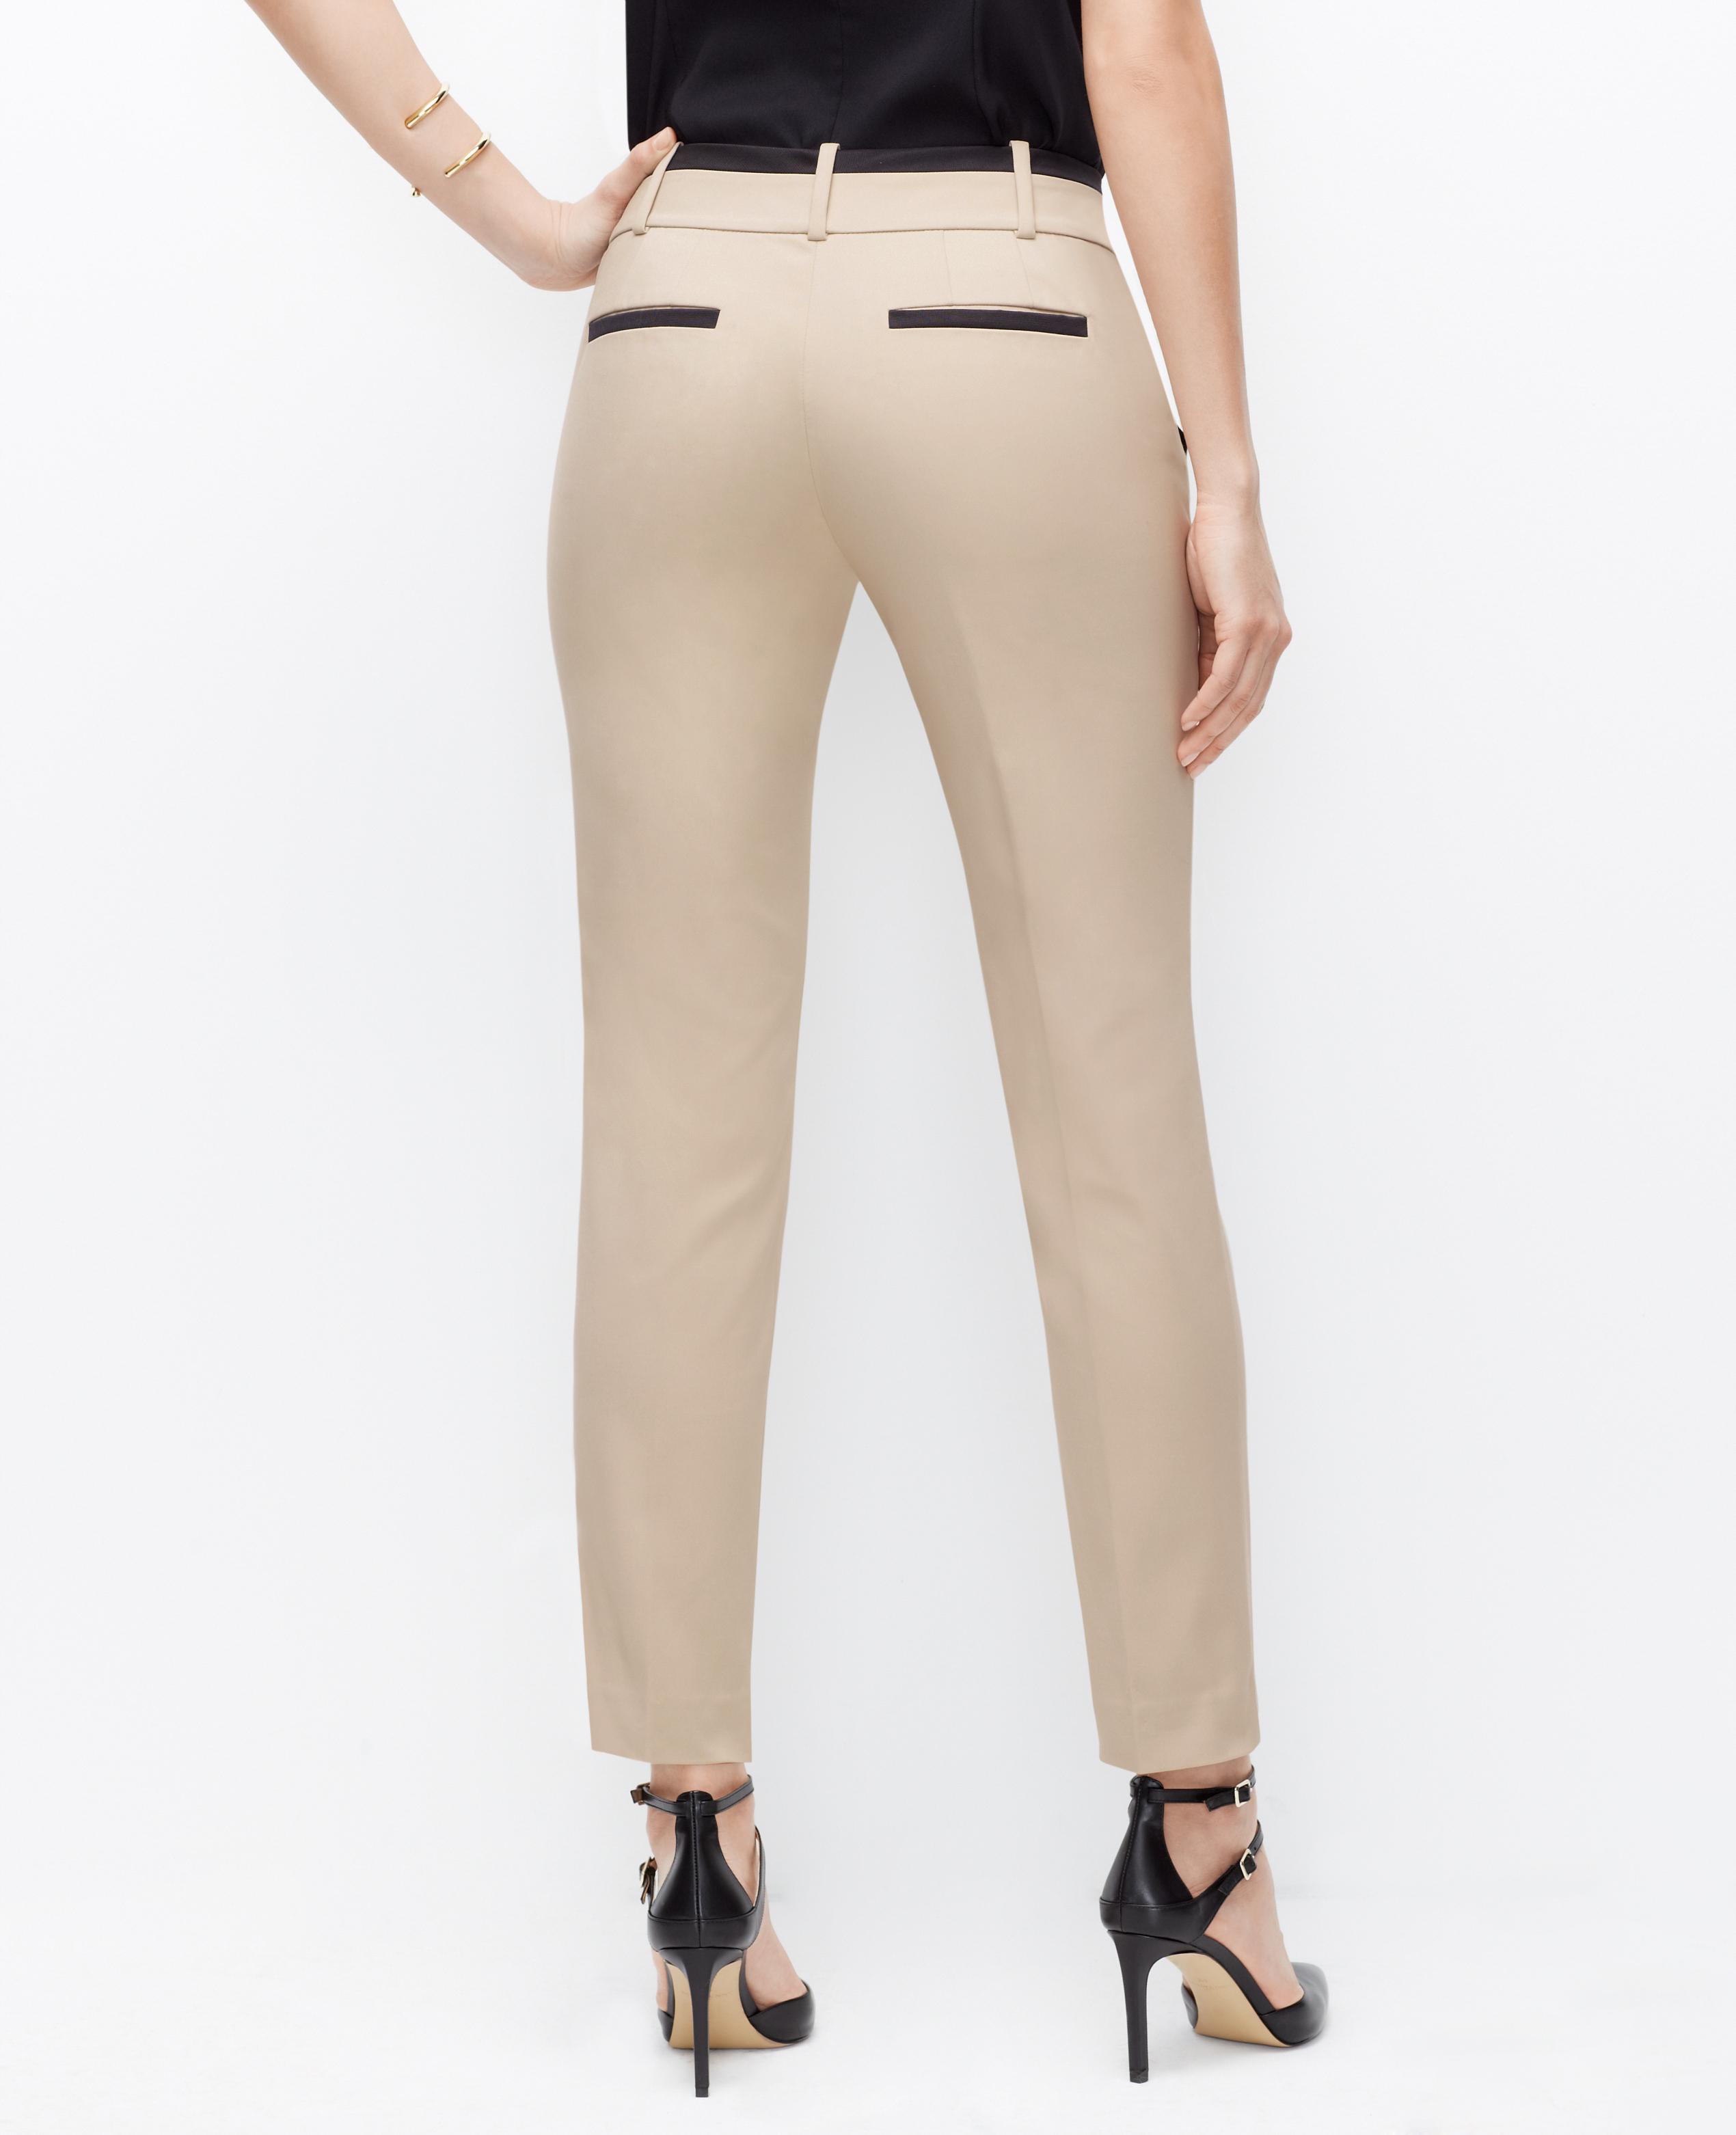 Khaki Pants For Women Tall - Pant Row